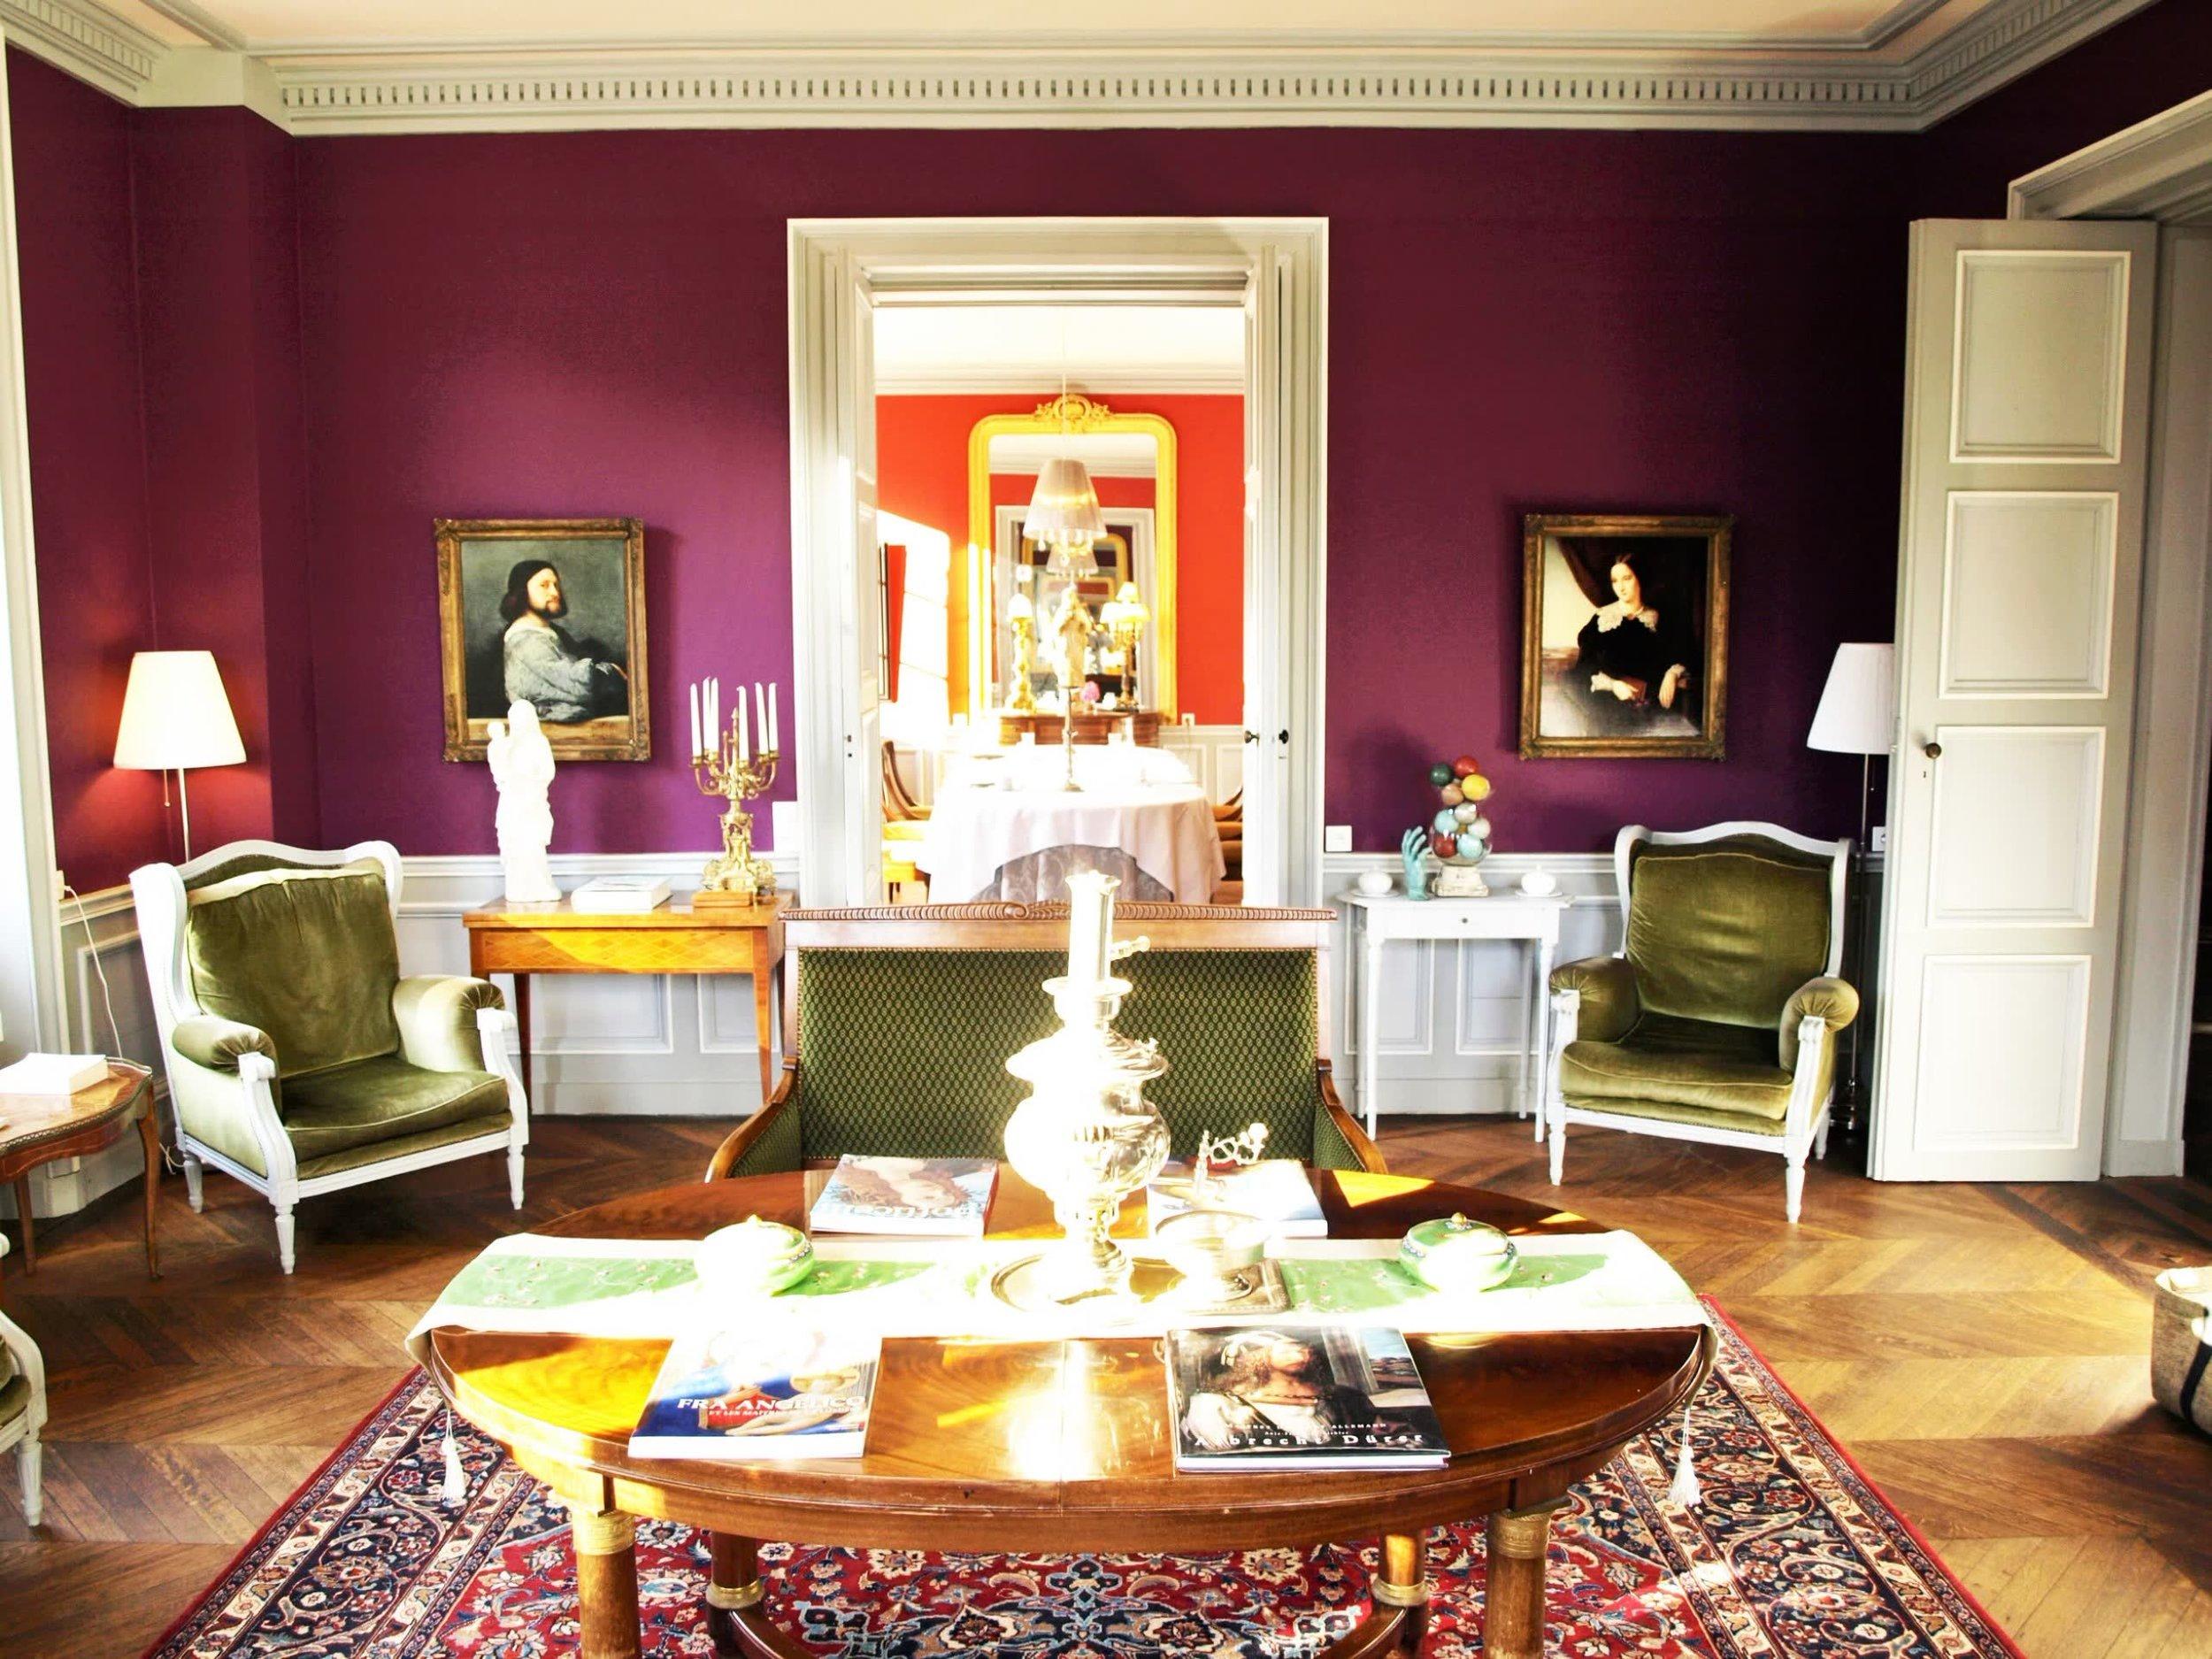 Chateau de la Pommeraye - charming boutique hotel chateau b&b spa normandy calvados Living room(1).jpg